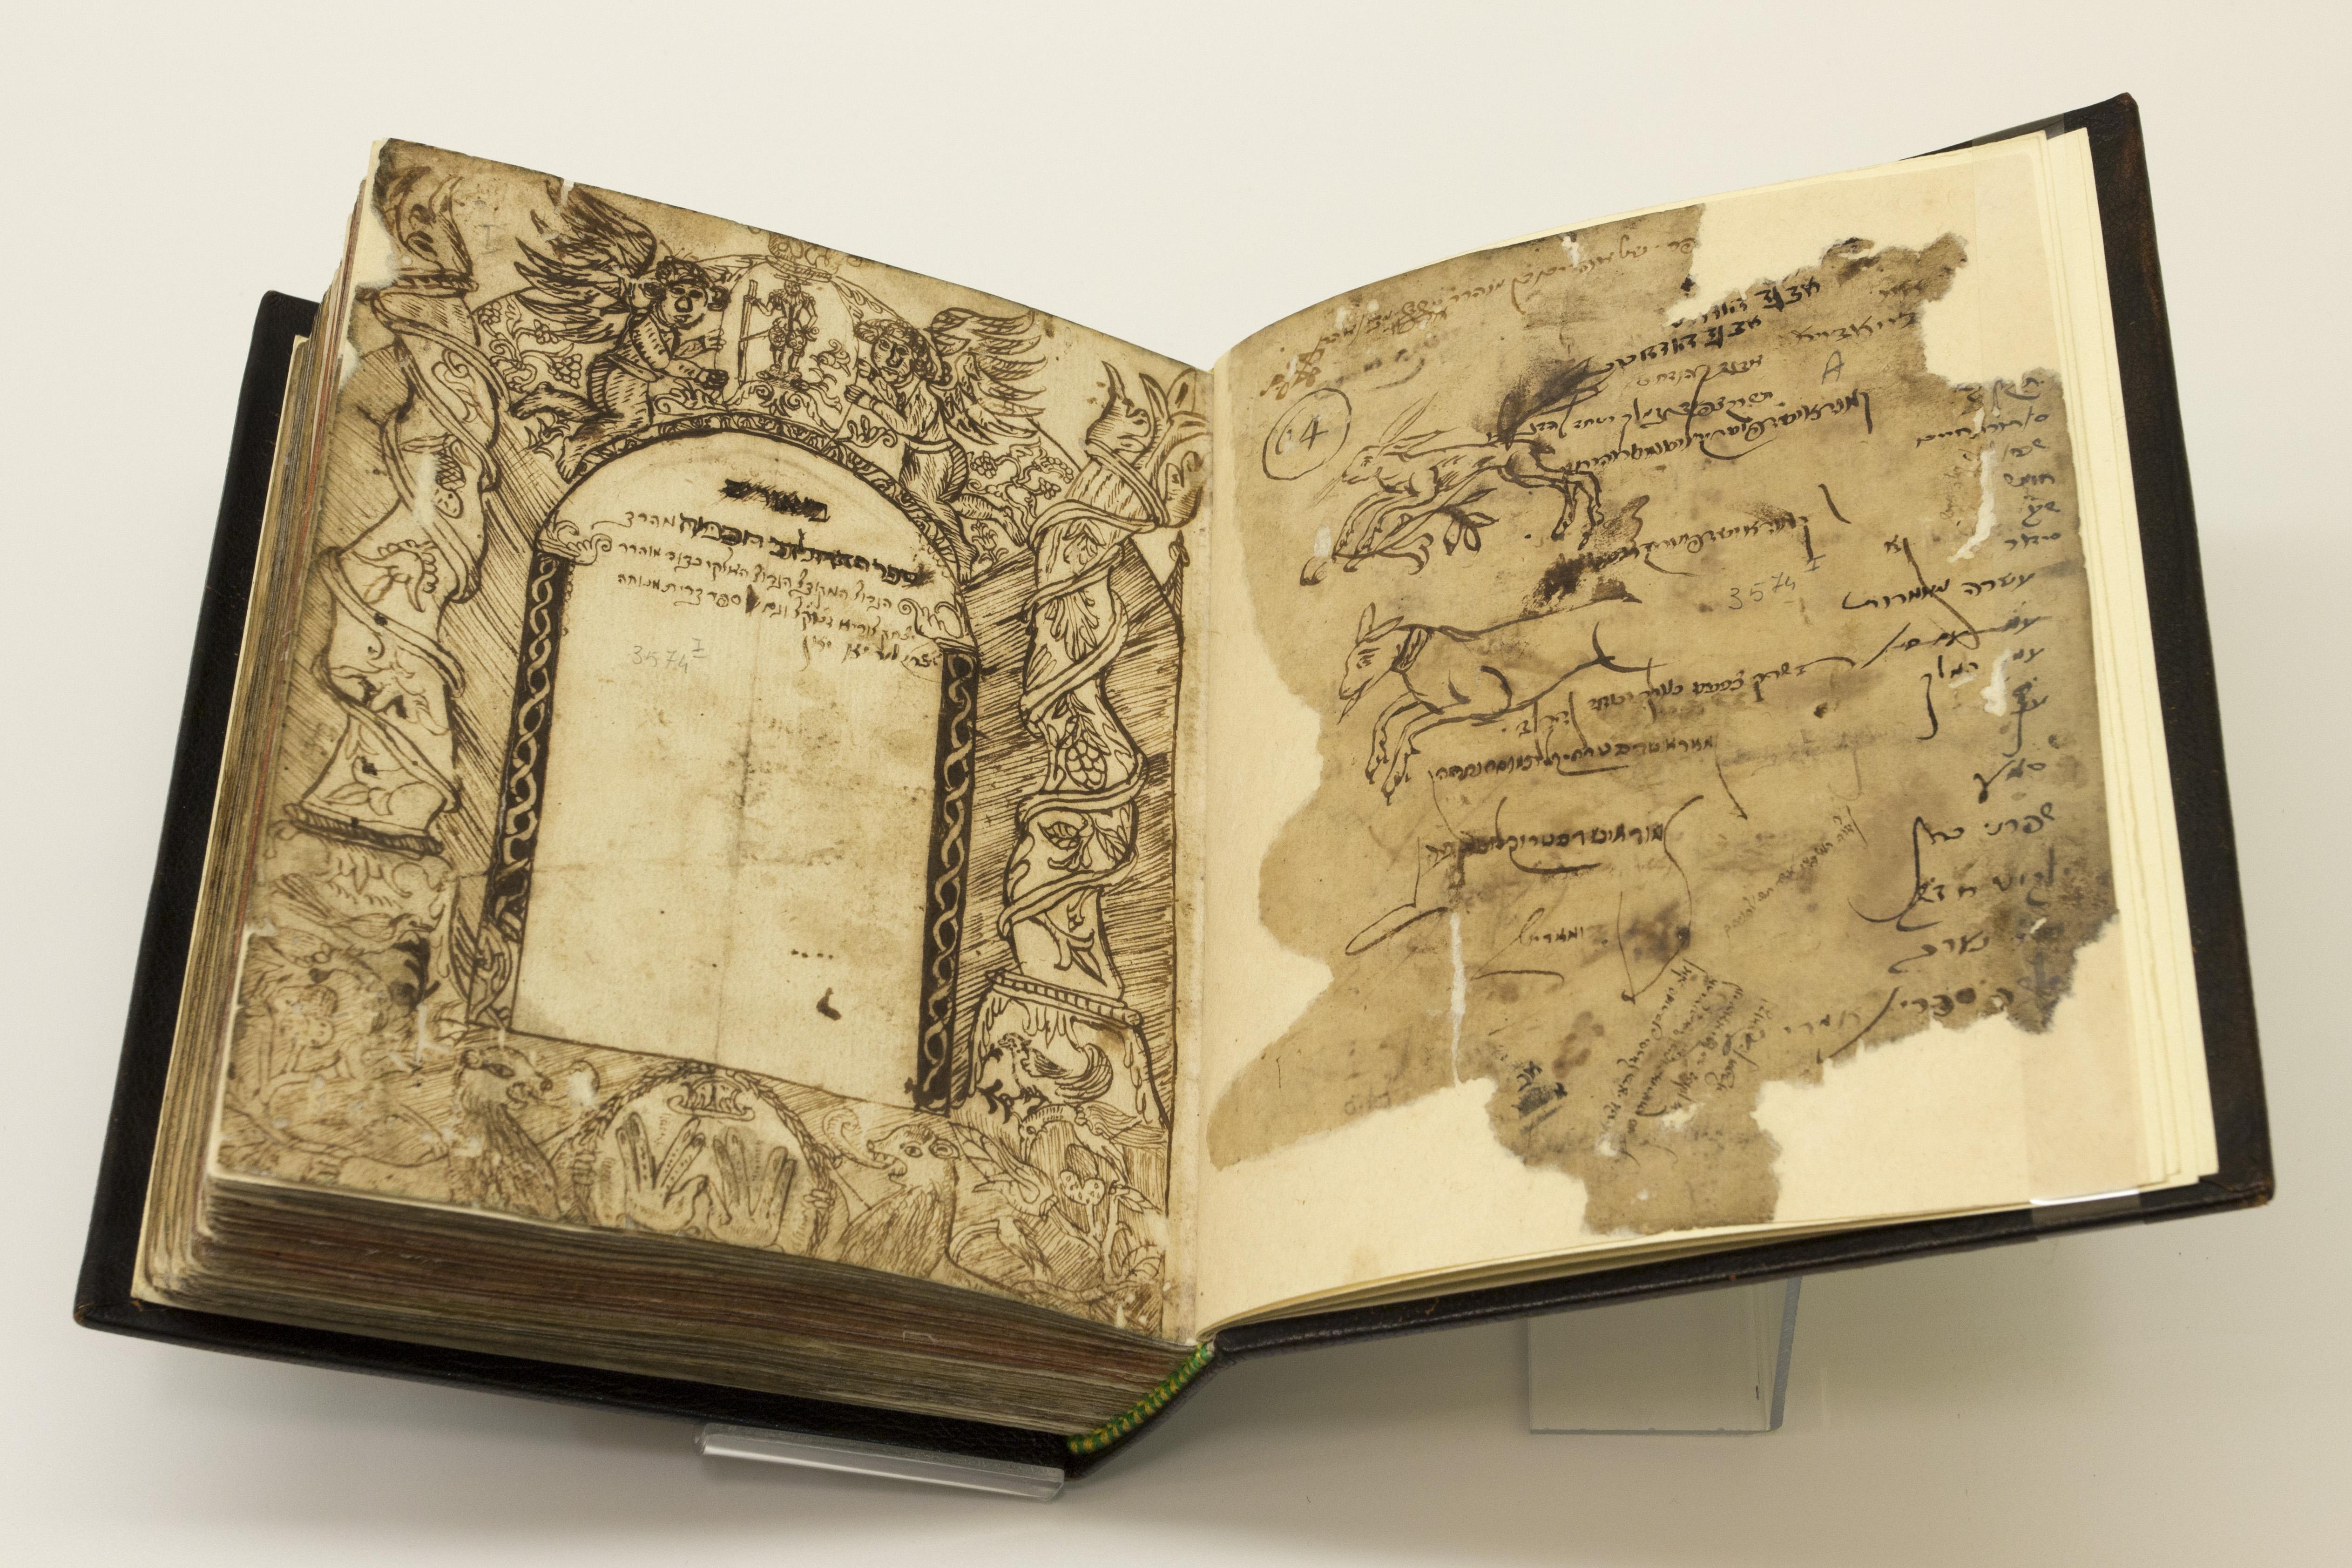 Biblioteca Universitaria di Bologna, Ebraici; ms. 3574 I